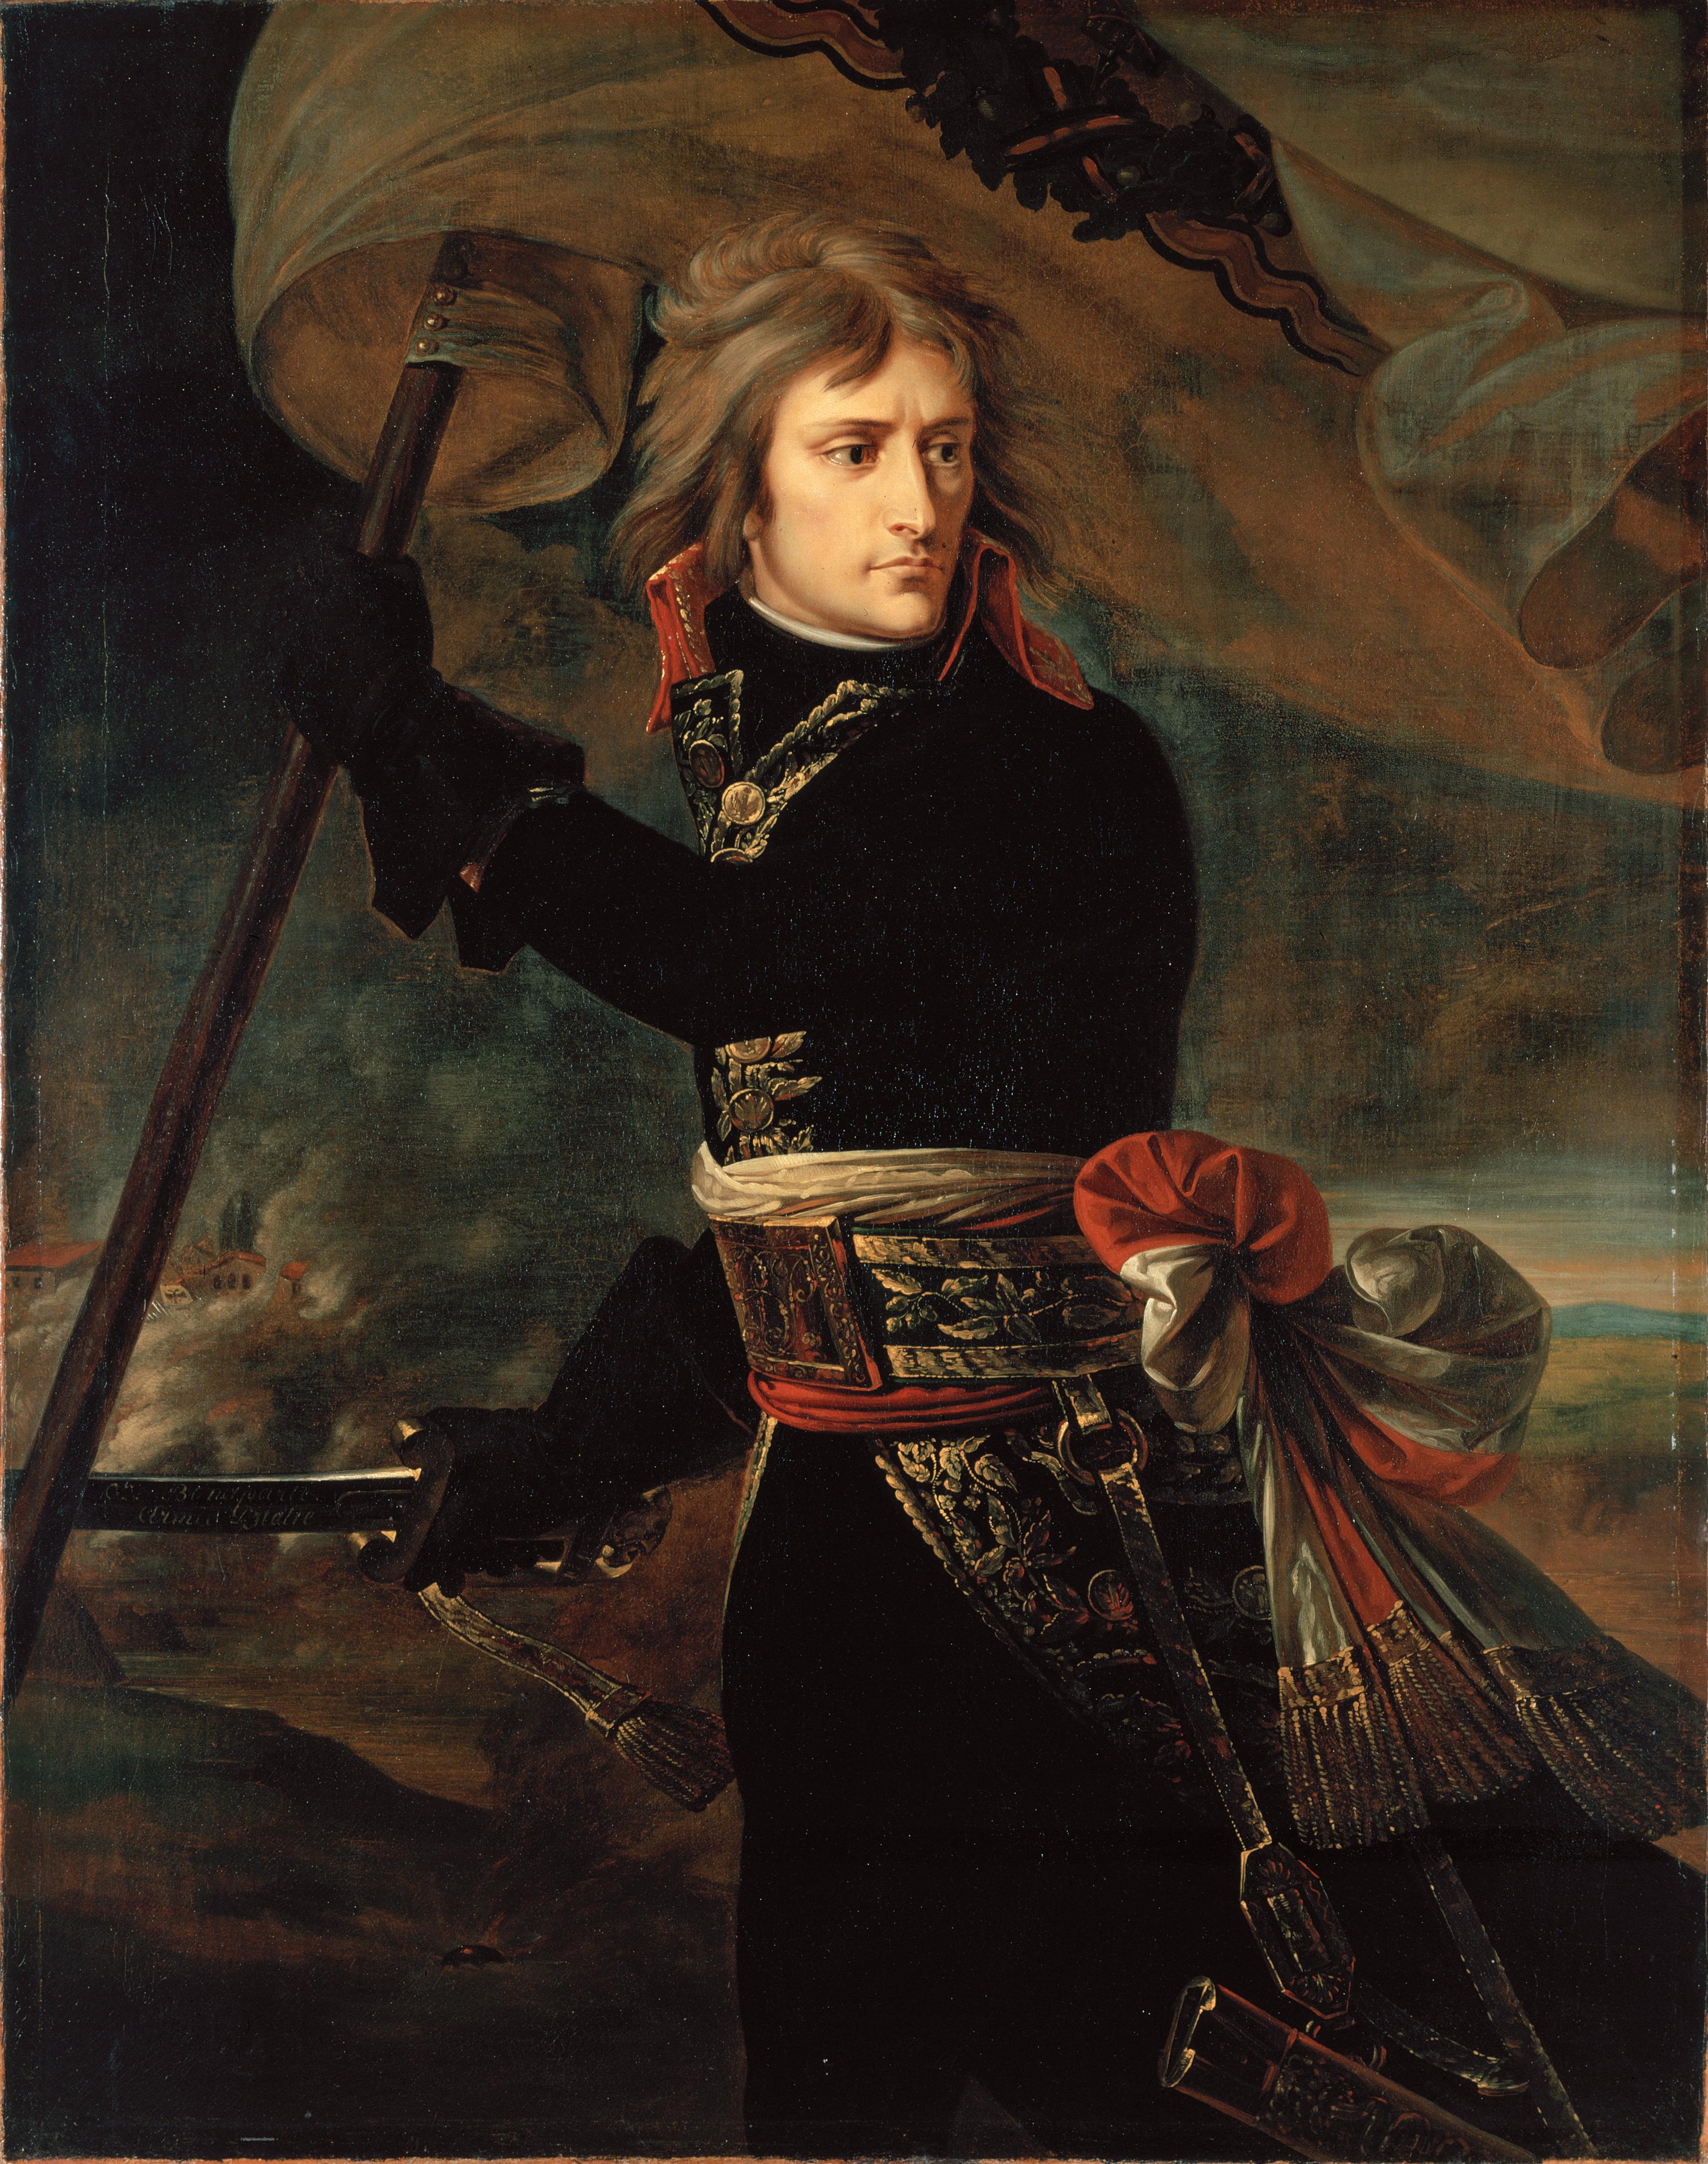 Gros,_Antoine-Jean,_baron_-_Napoleon_Bonaparte_on_the_Bridge_at_Arcole